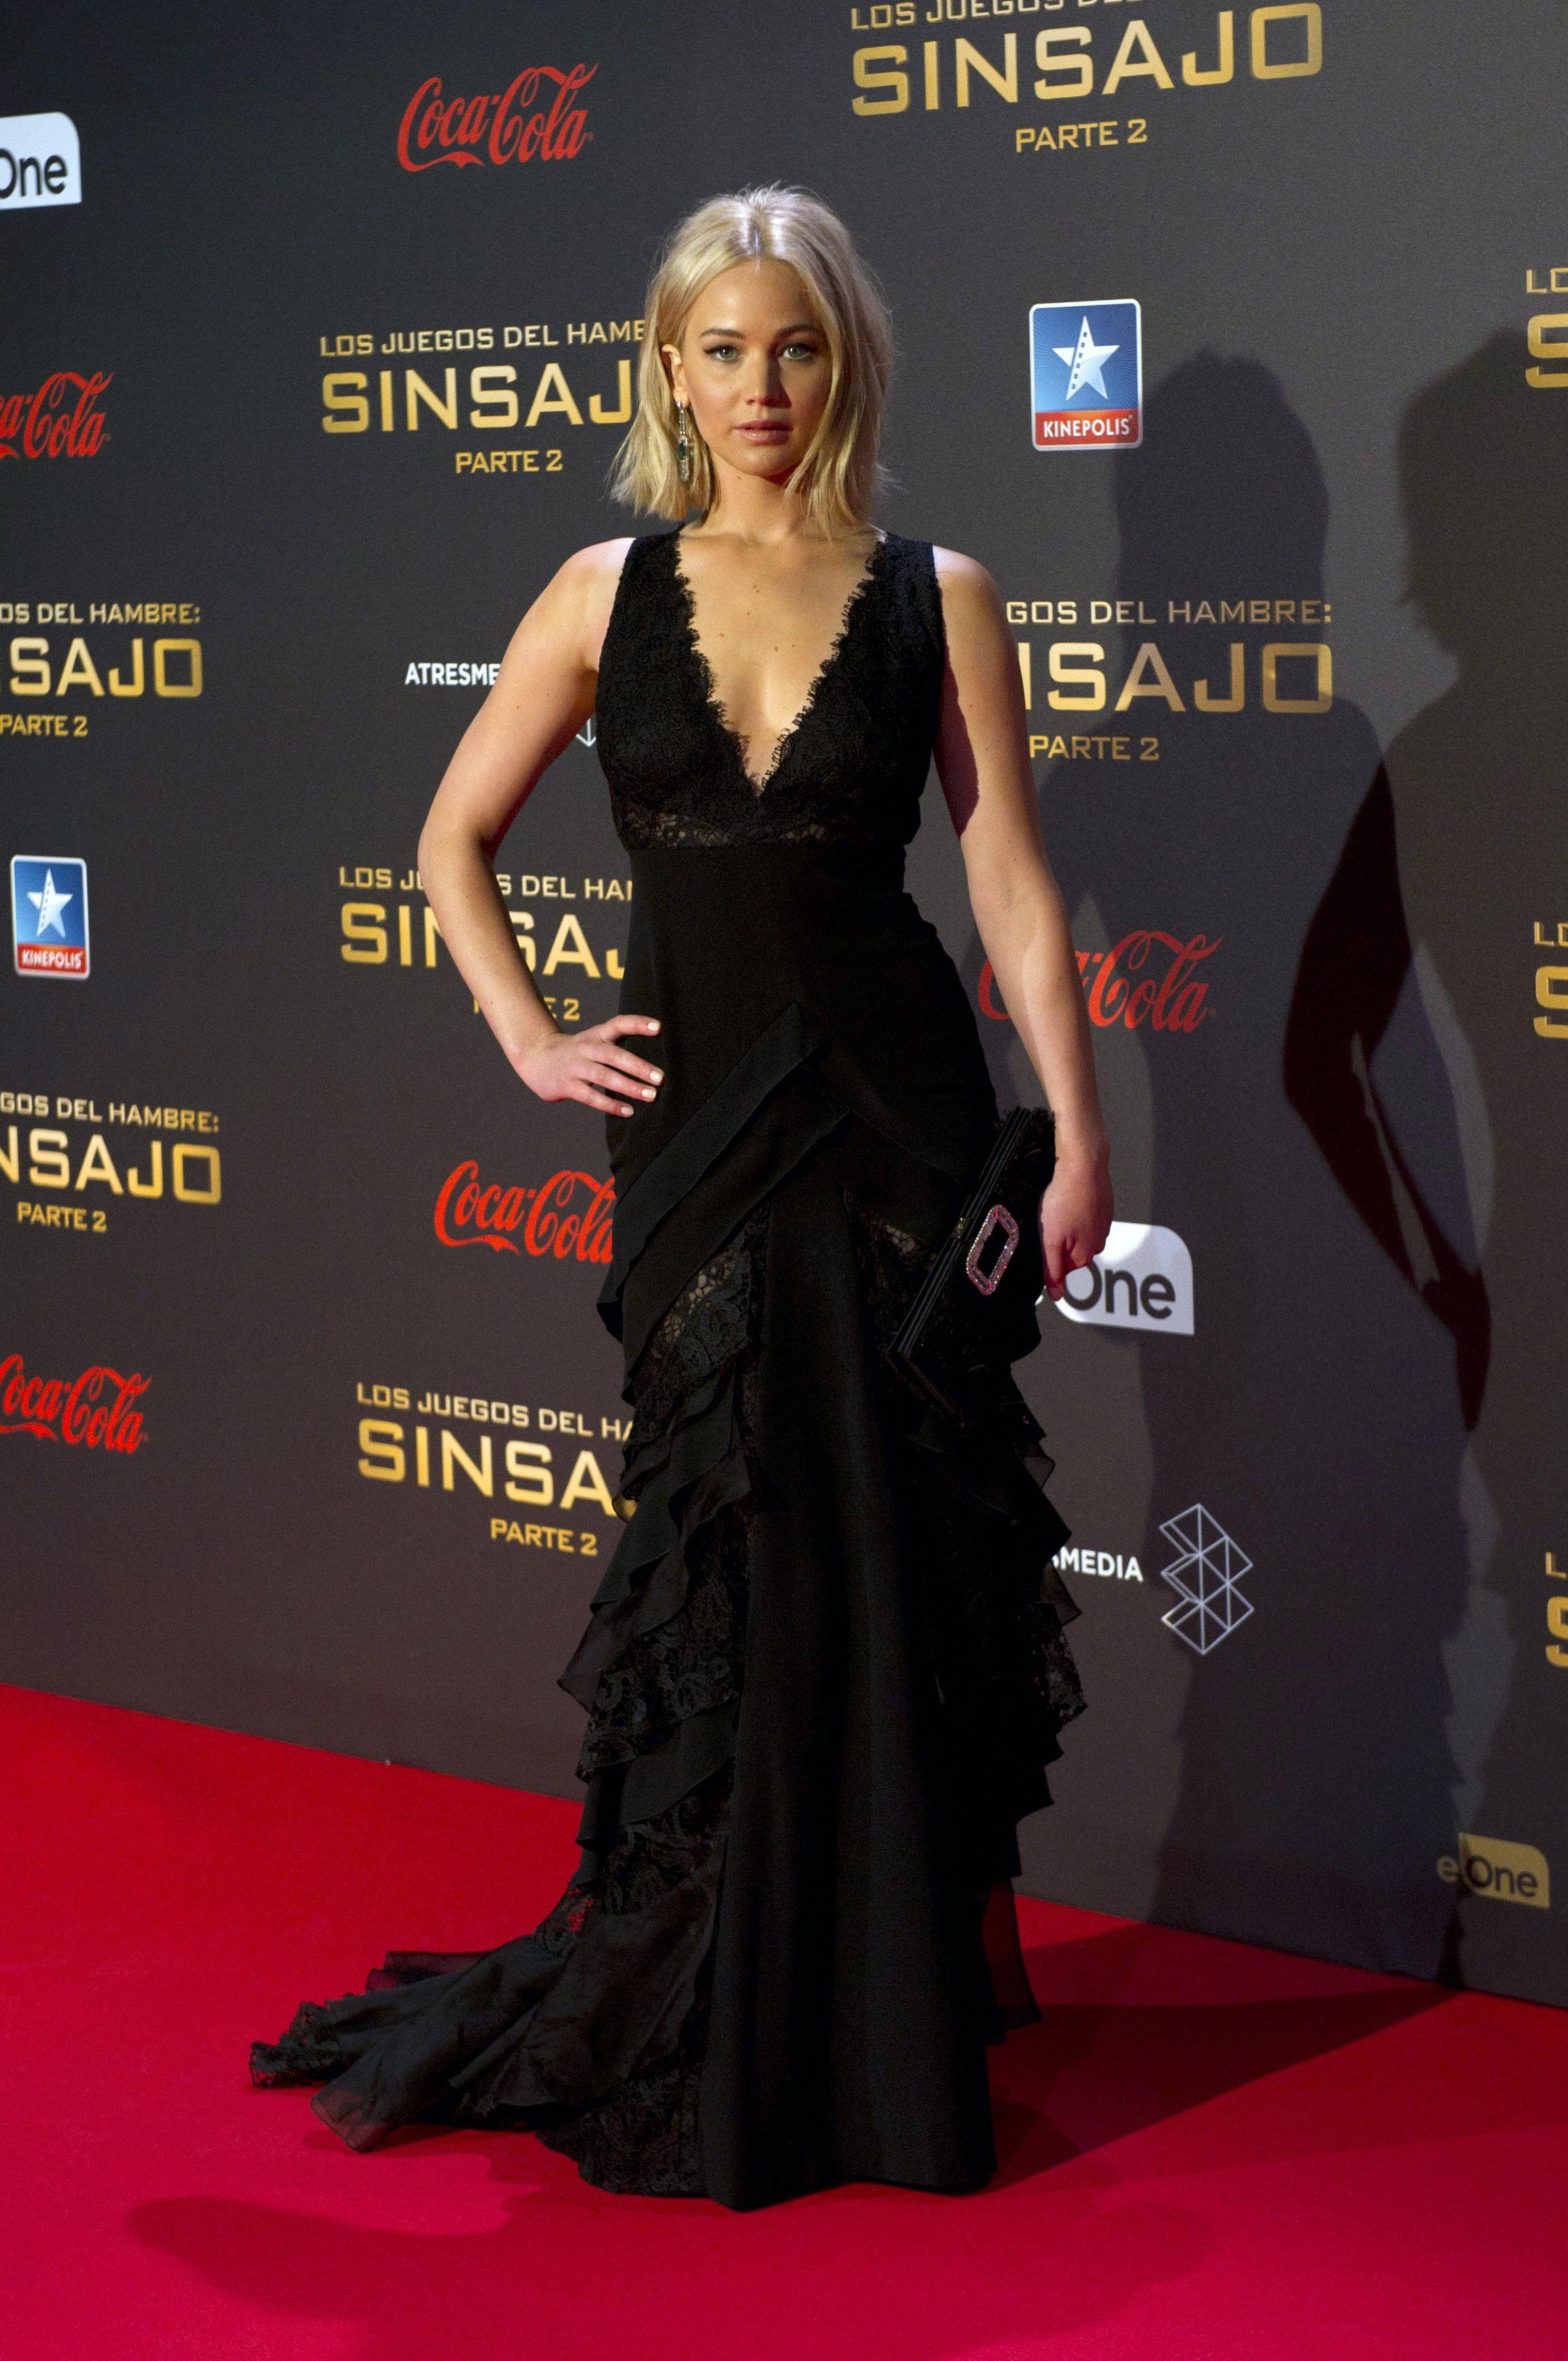 Jennifer Lawrence Rocks A Sheer Dress On The Red Carpet Jennifer Lawrence Style Red Carpet Dresses Black Lace Gown [ 3478 x 2310 Pixel ]